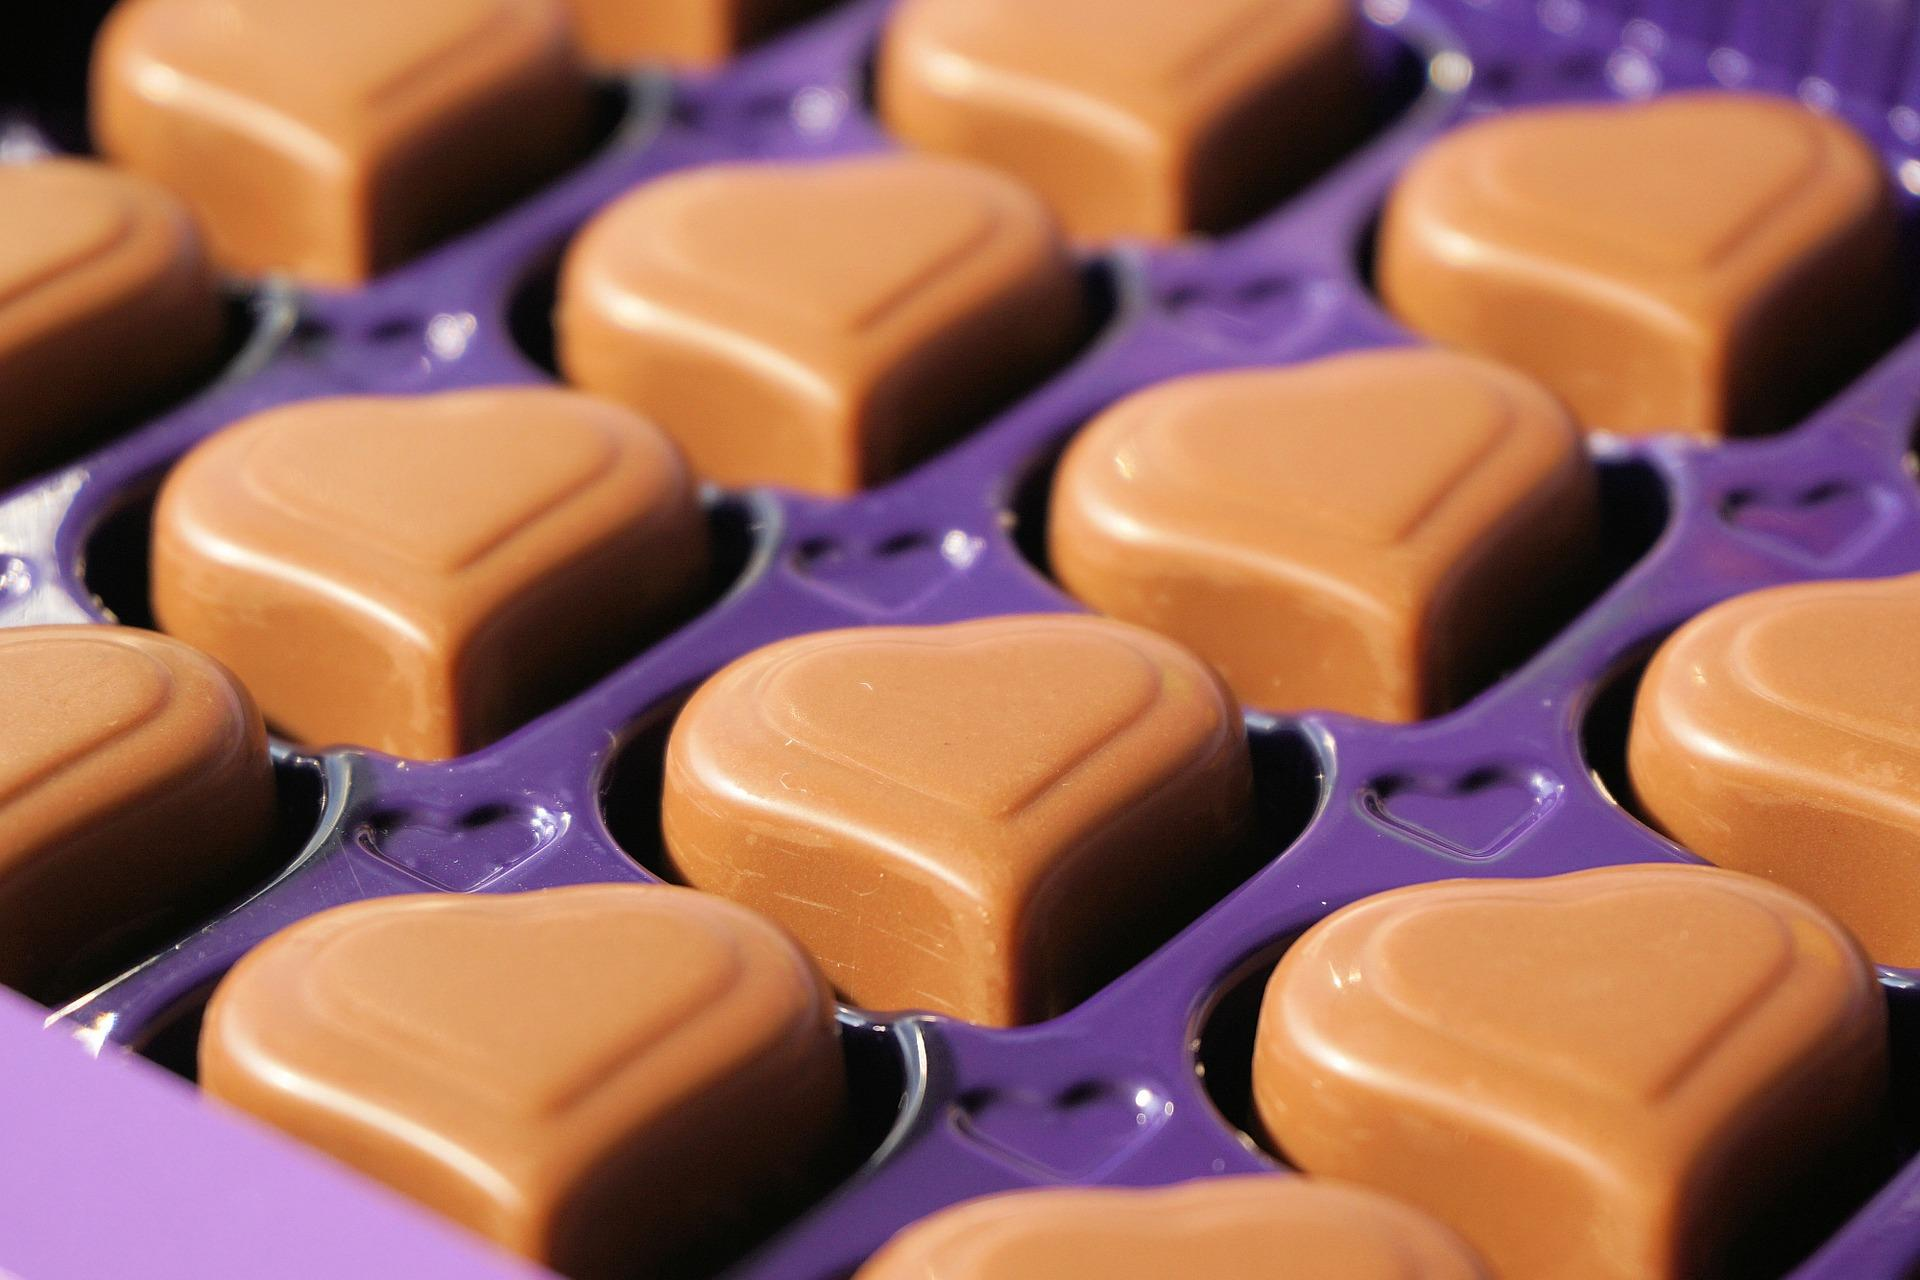 chocolates-1247245_1920-1495758747189.jpg